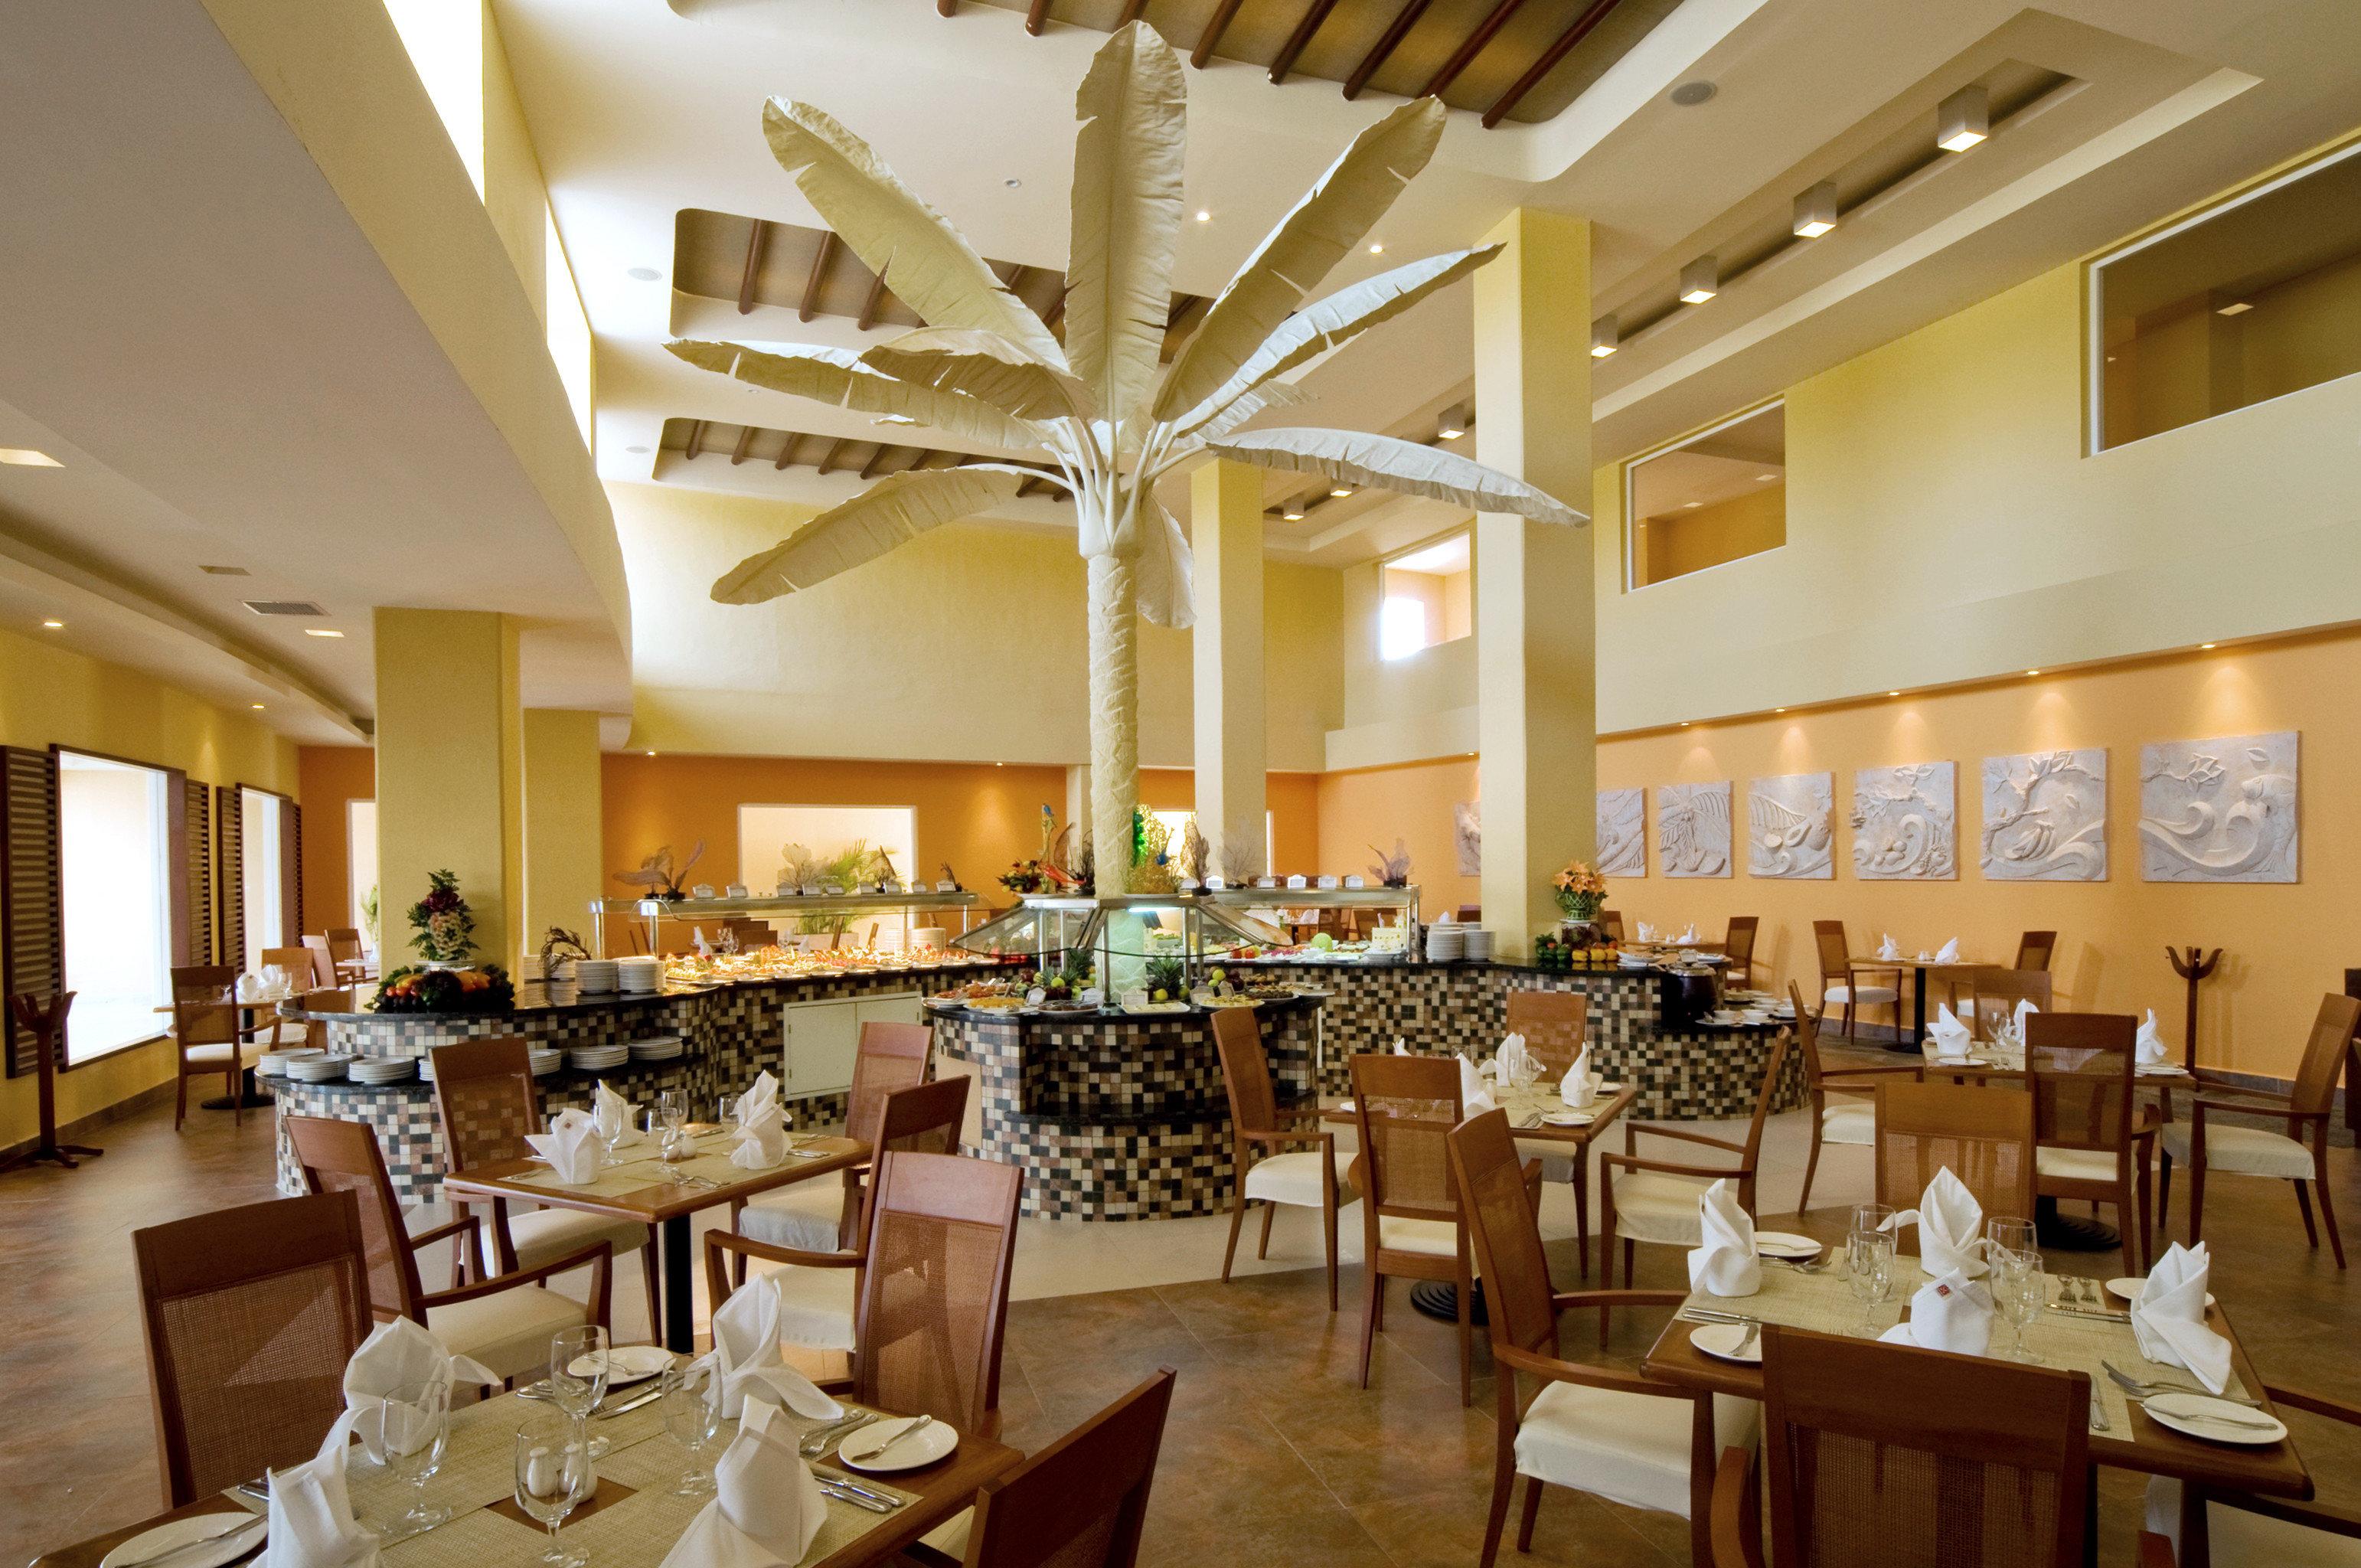 Bar Beachfront Dining Drink Eat Luxury chair restaurant function hall Resort convention center set